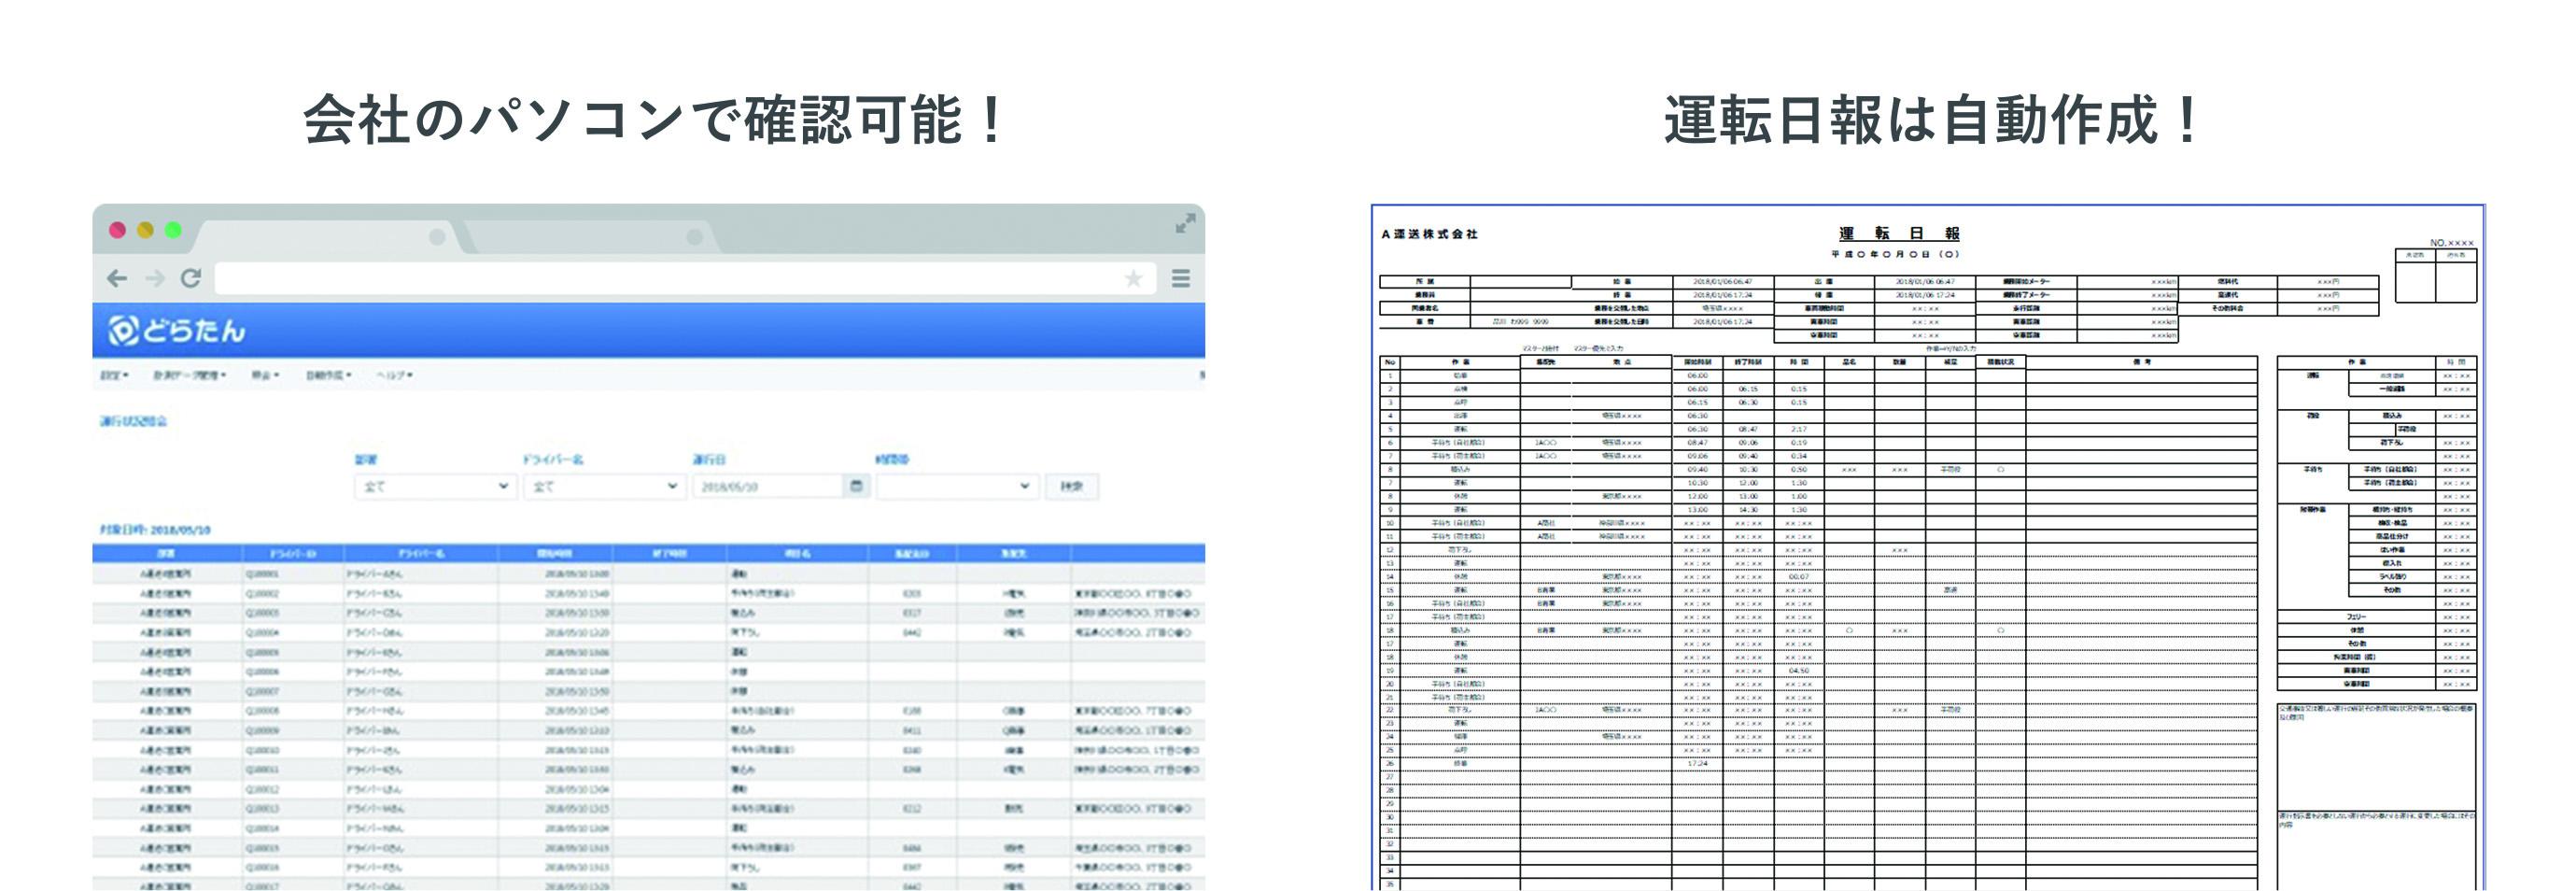 管理者用のWEB画面